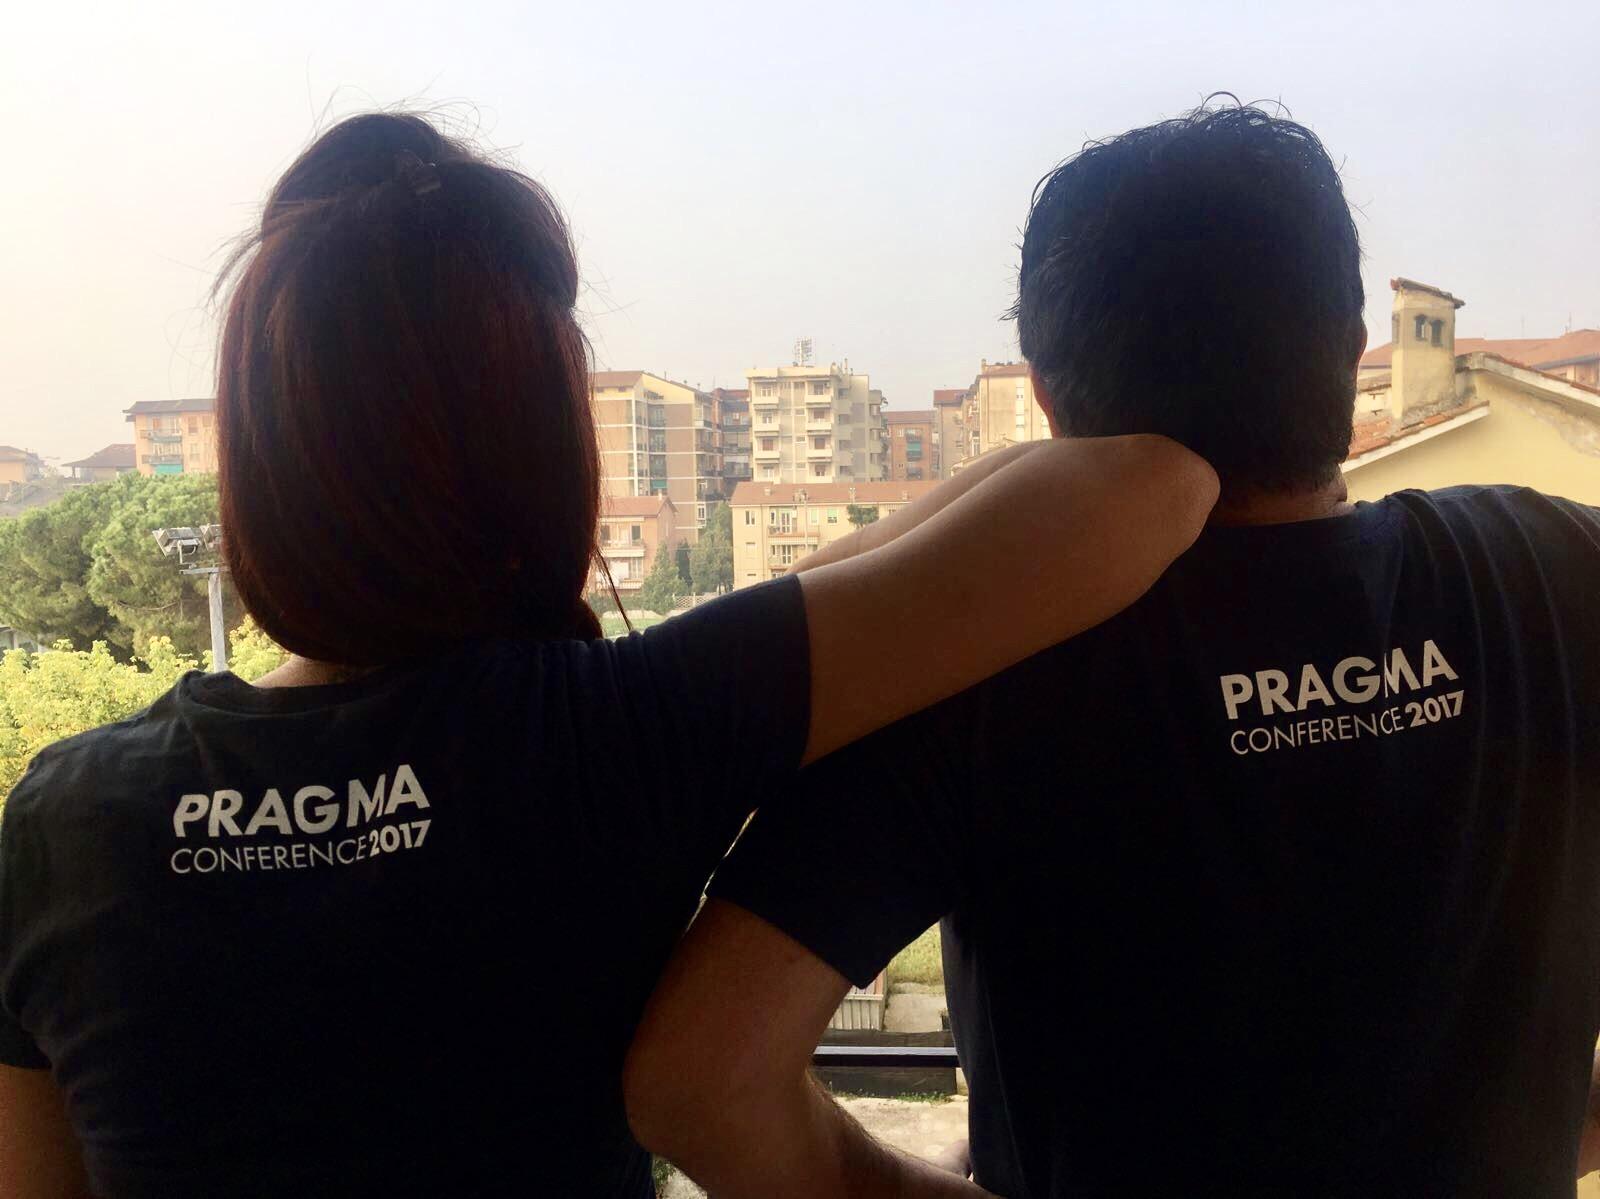 Pragma Conference 2017